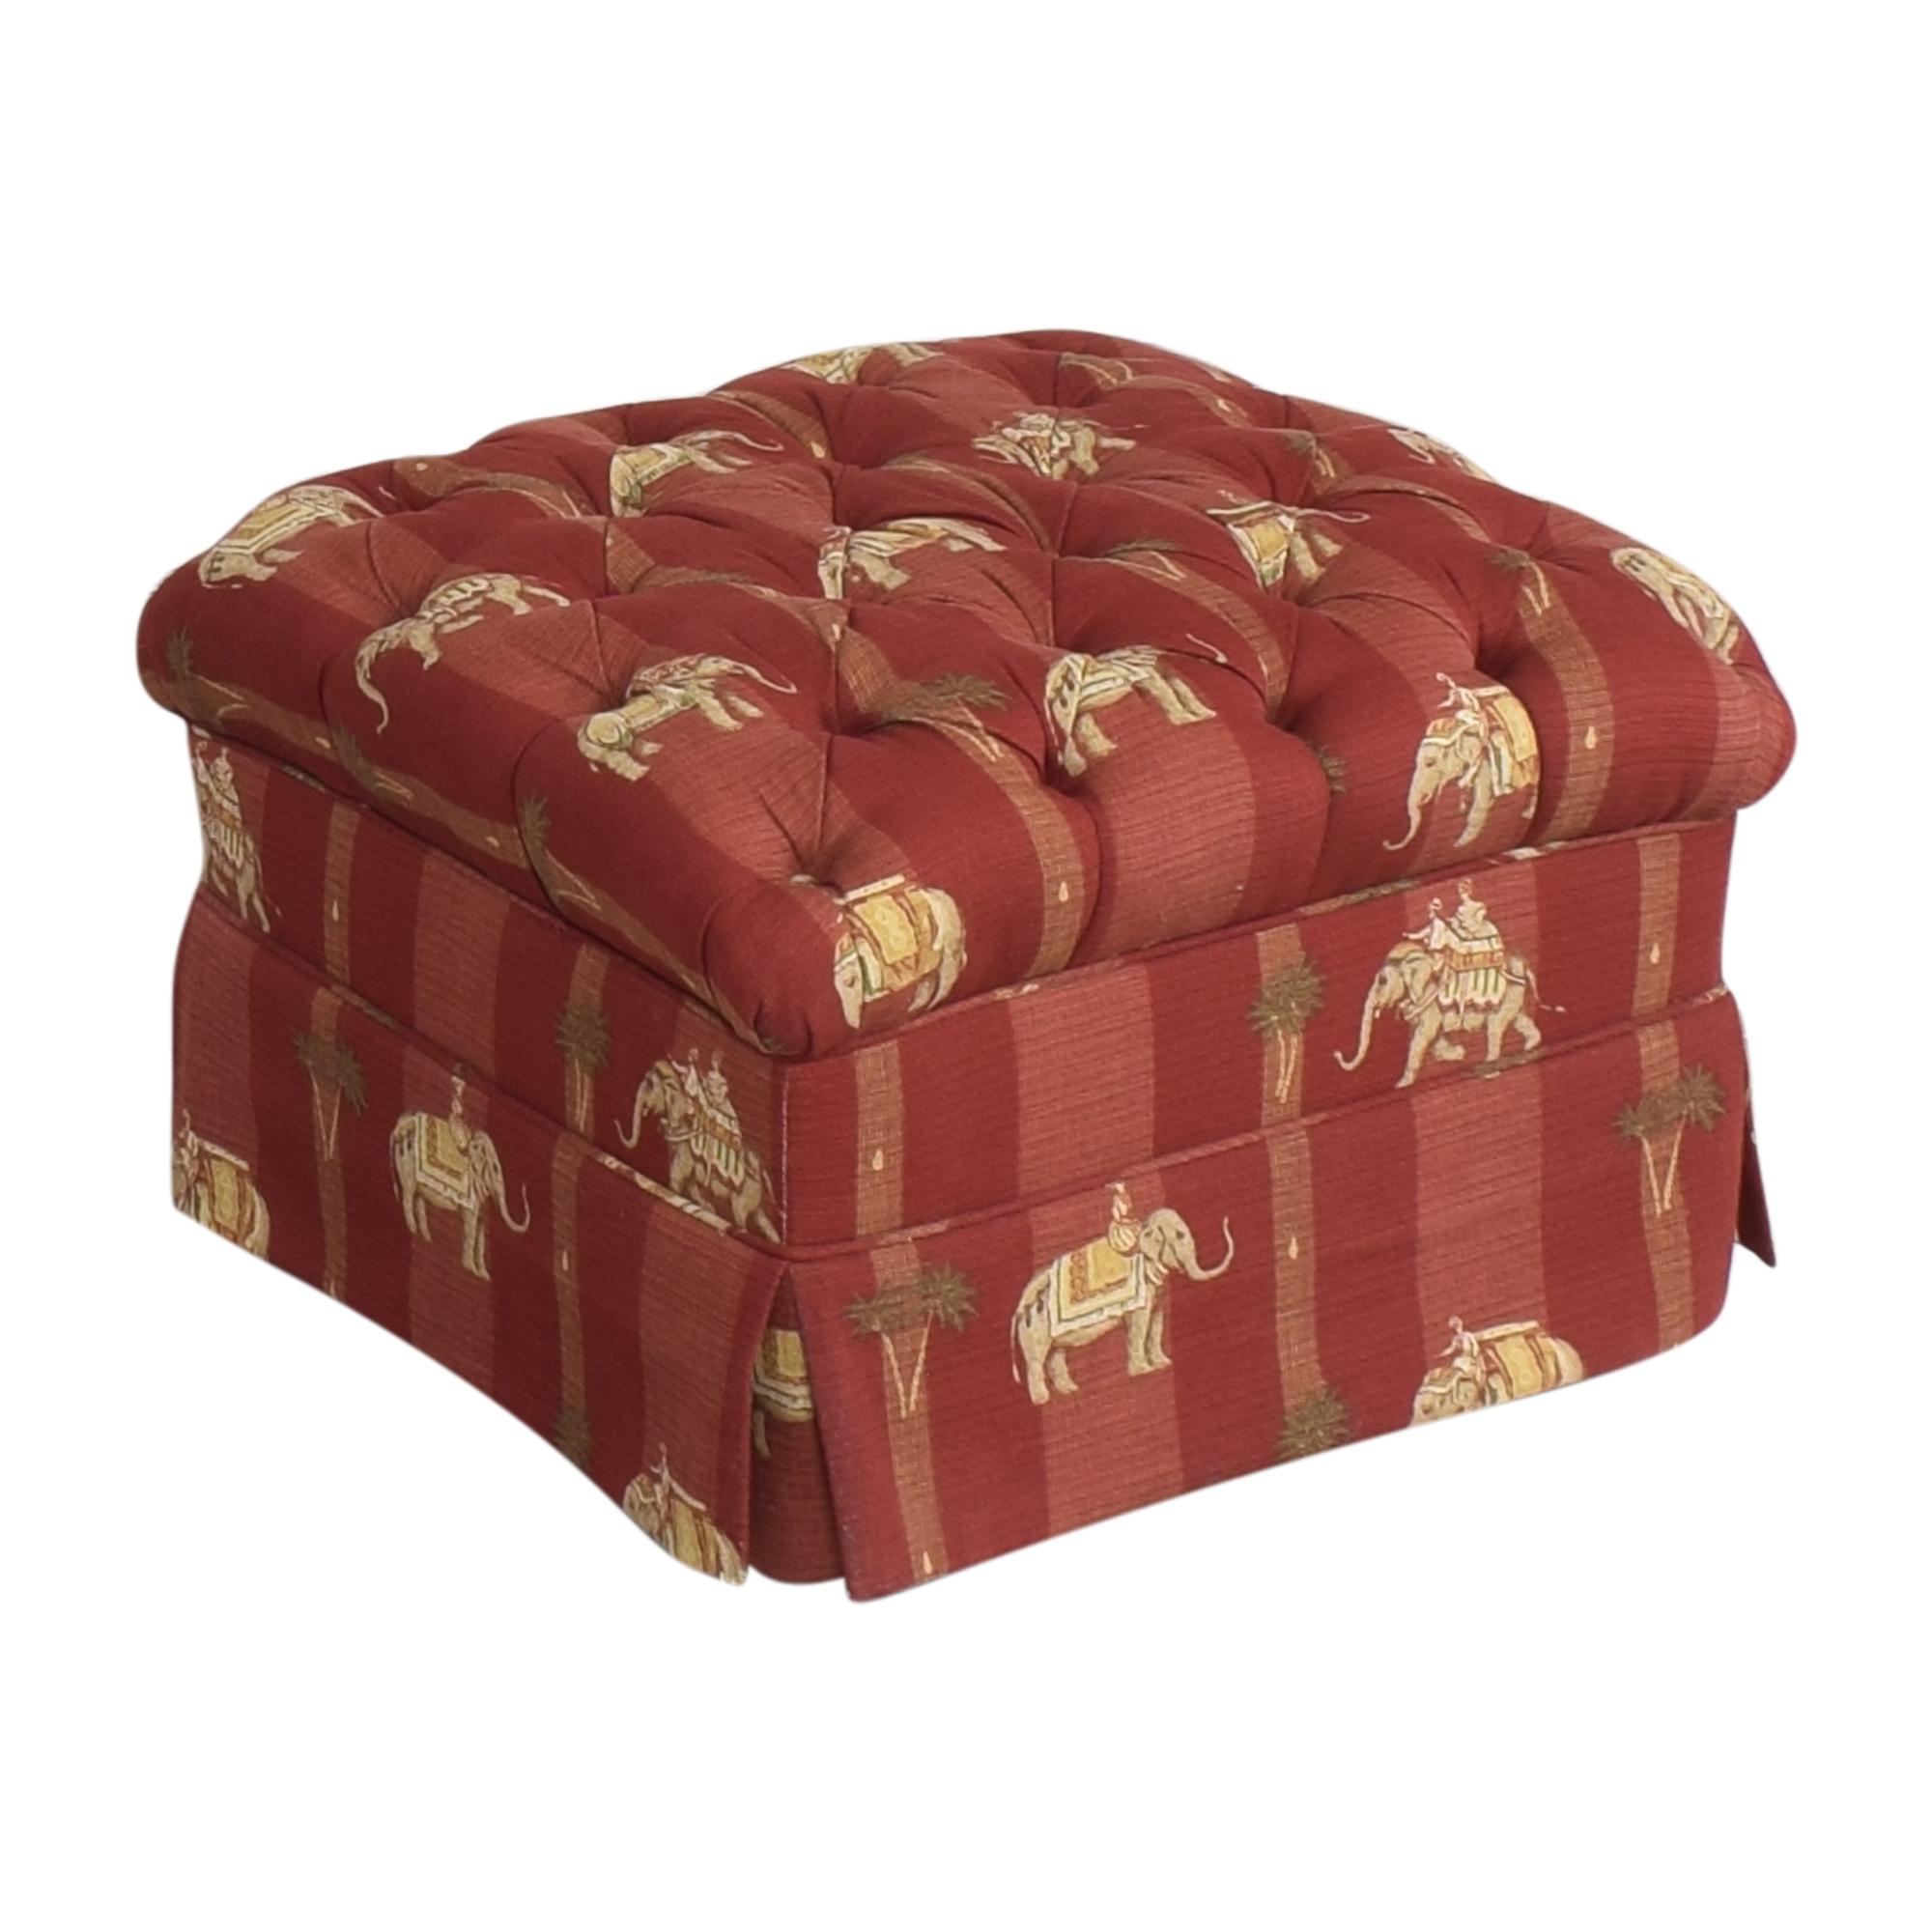 buy Custom Tufted Ottoman